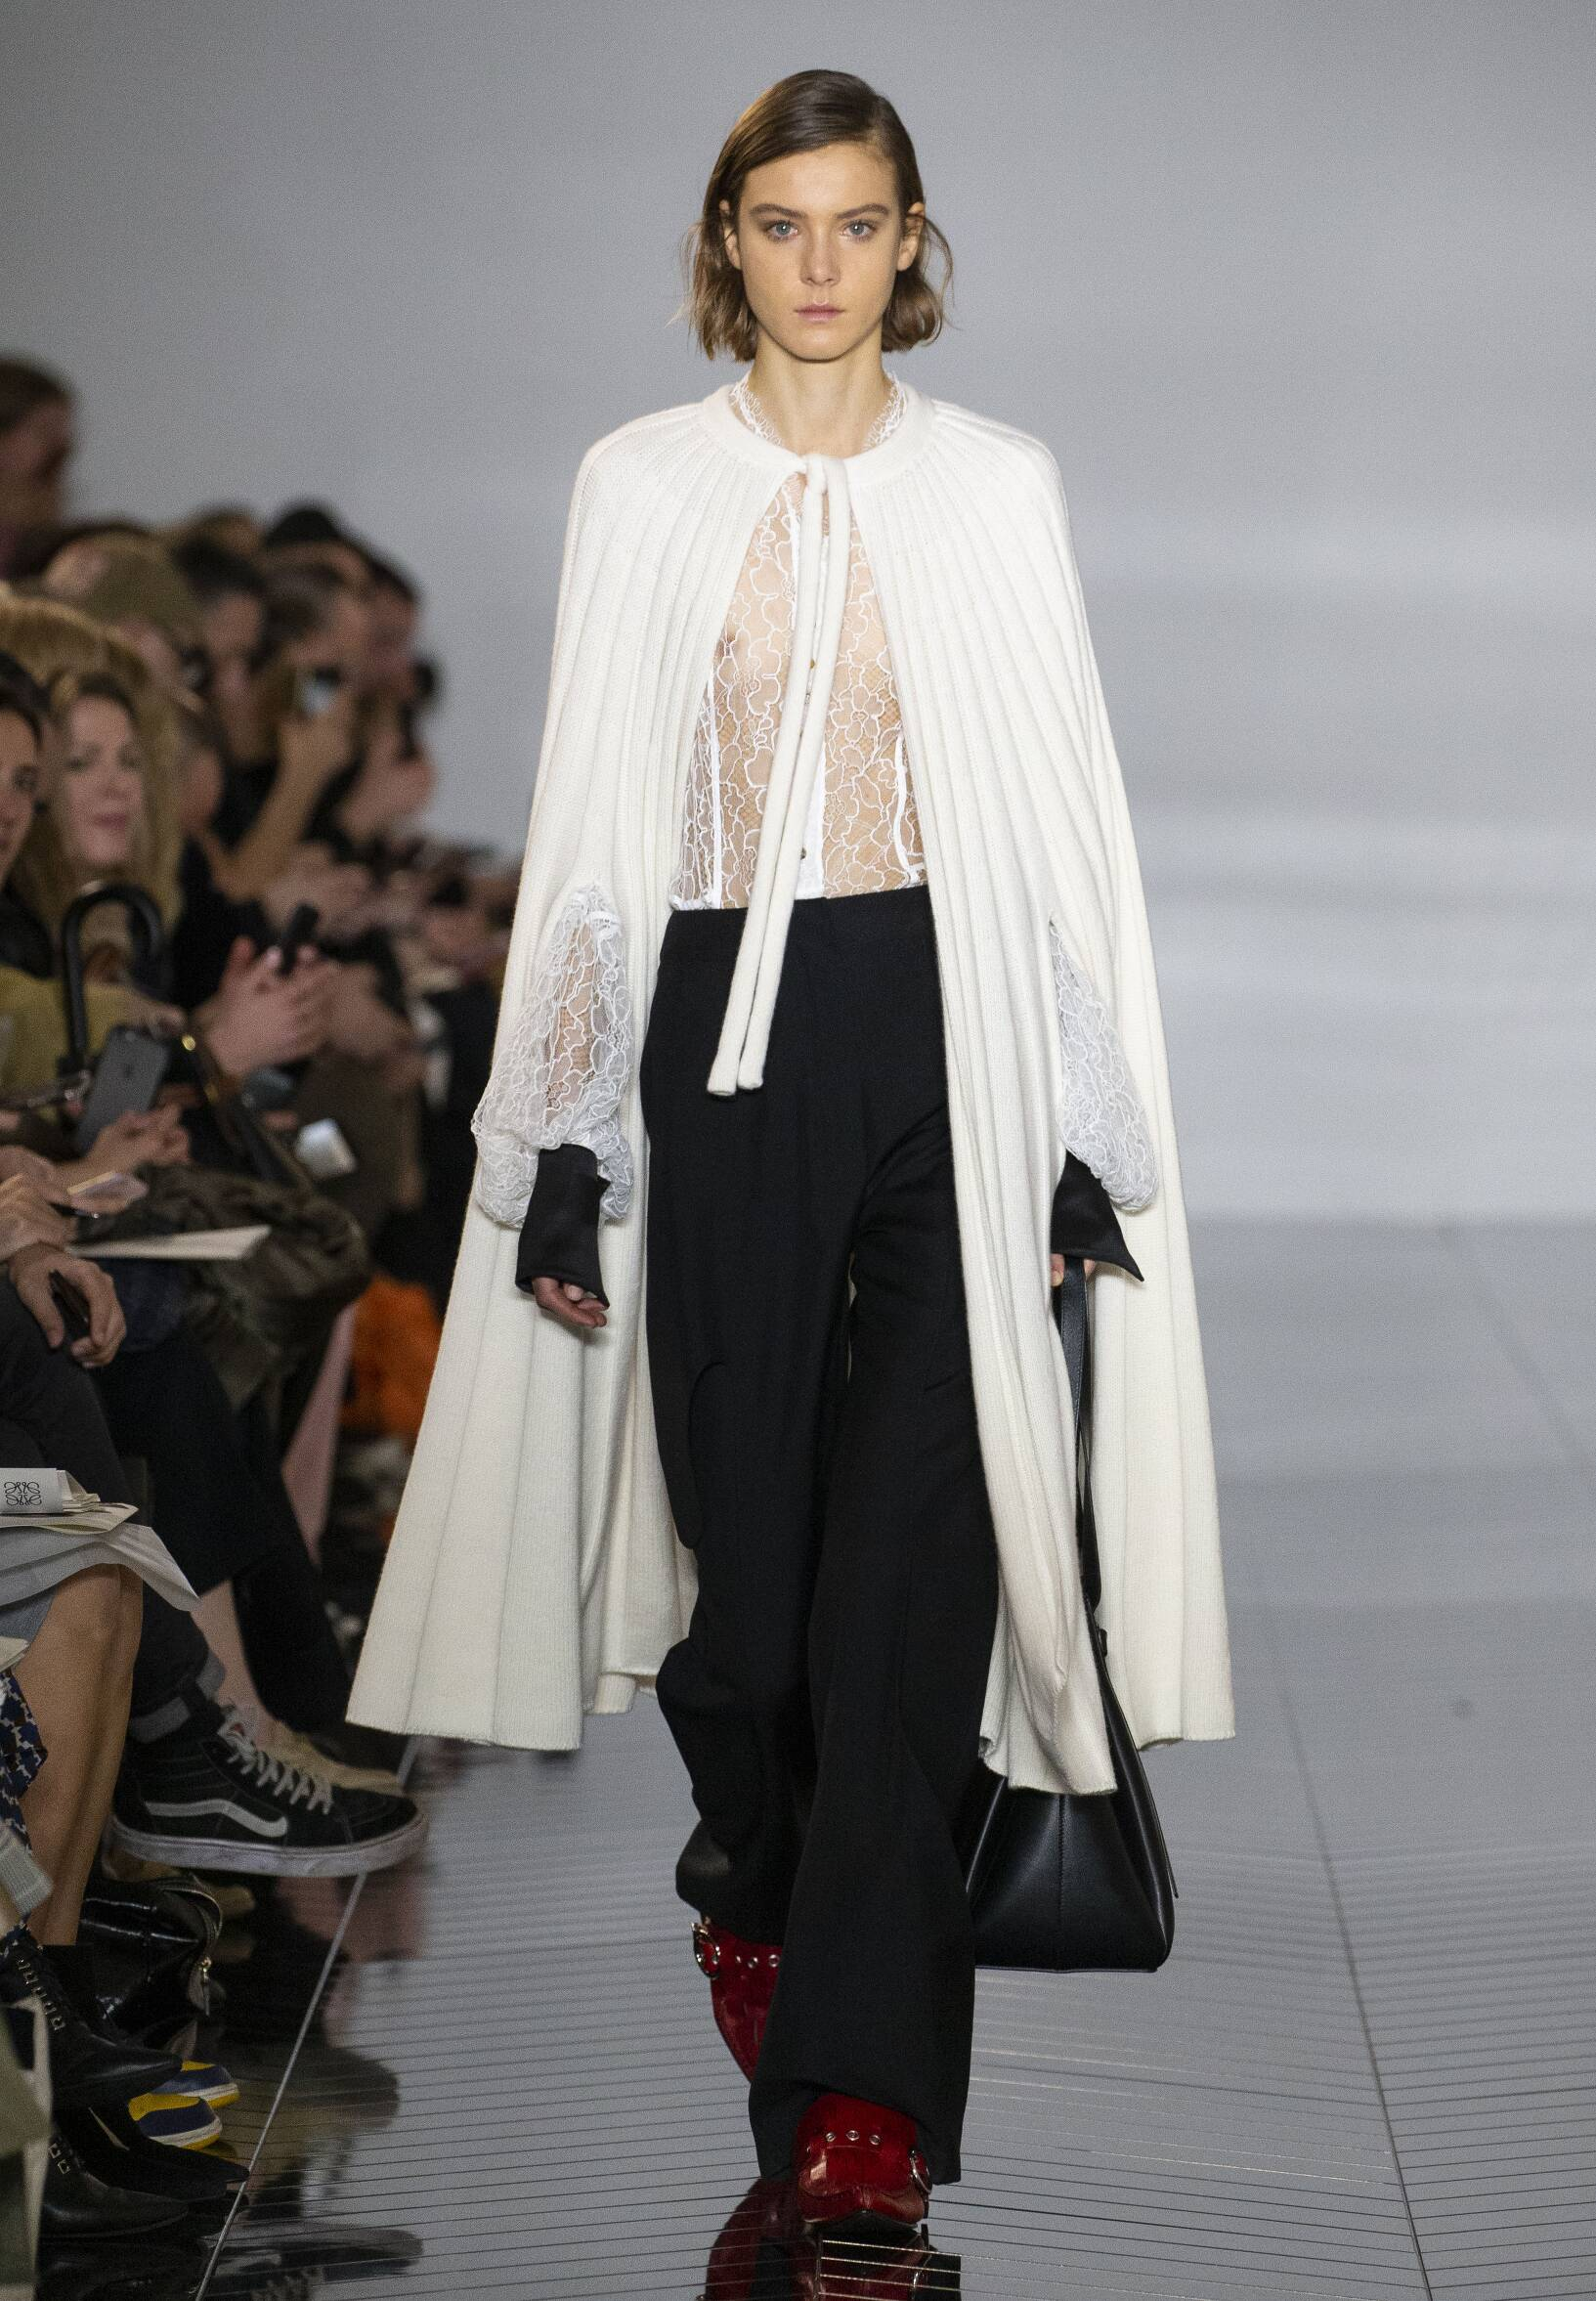 FW 2019-20 Loewe Fashion Show